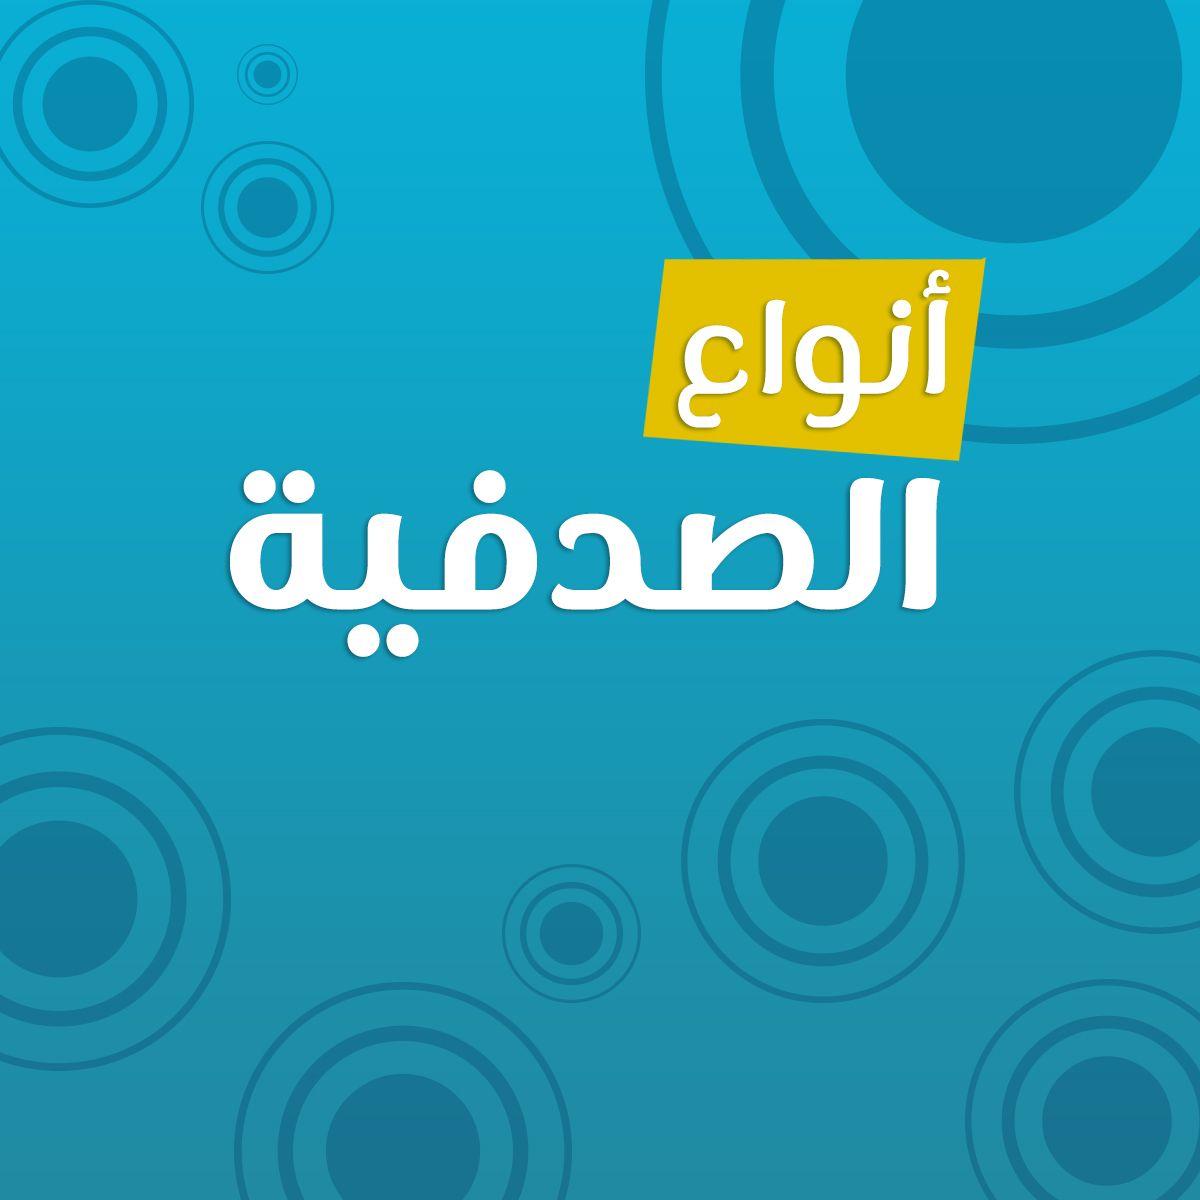 Pin By الدكتور أحمد أبو النصر On الأمراض و ثقافتها Lockscreen Lockscreen Screenshot